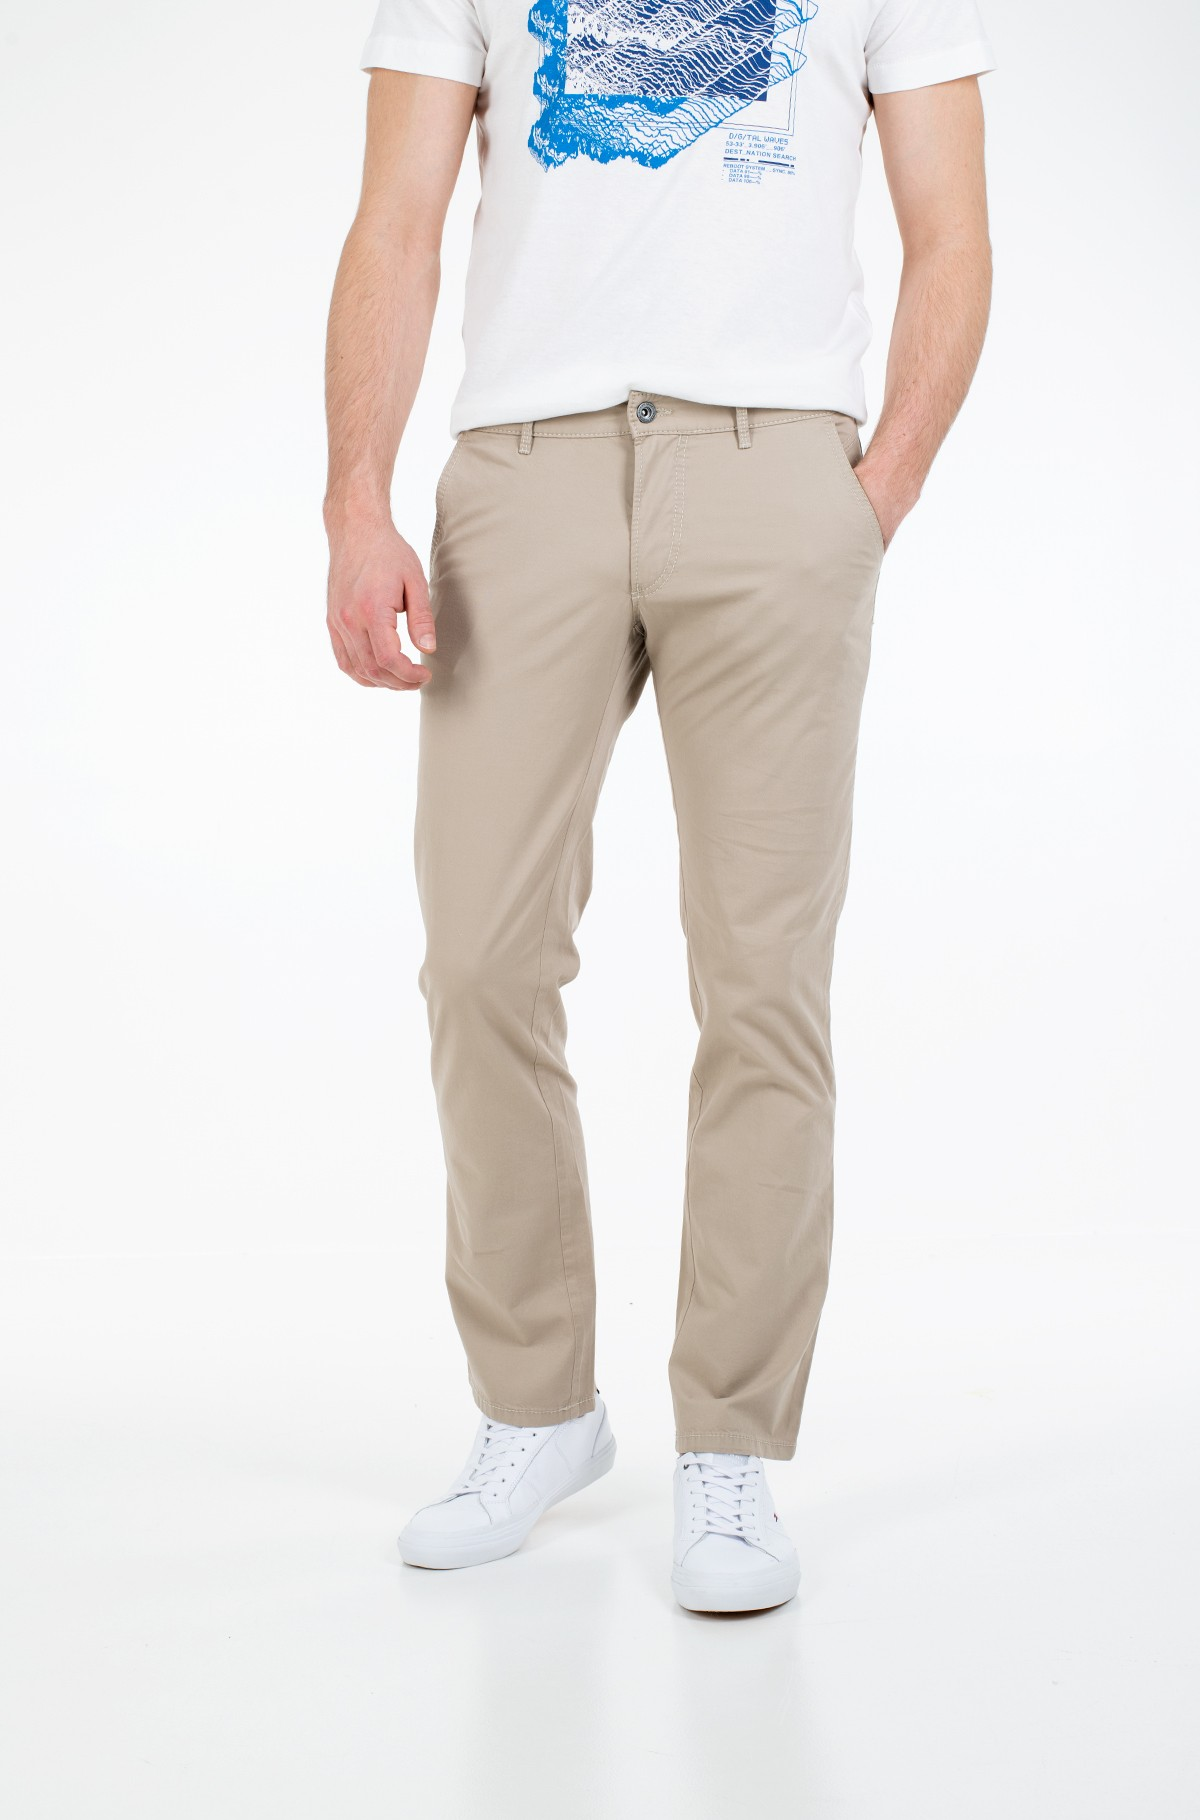 Fabric trousers 477965/3-24-full-1